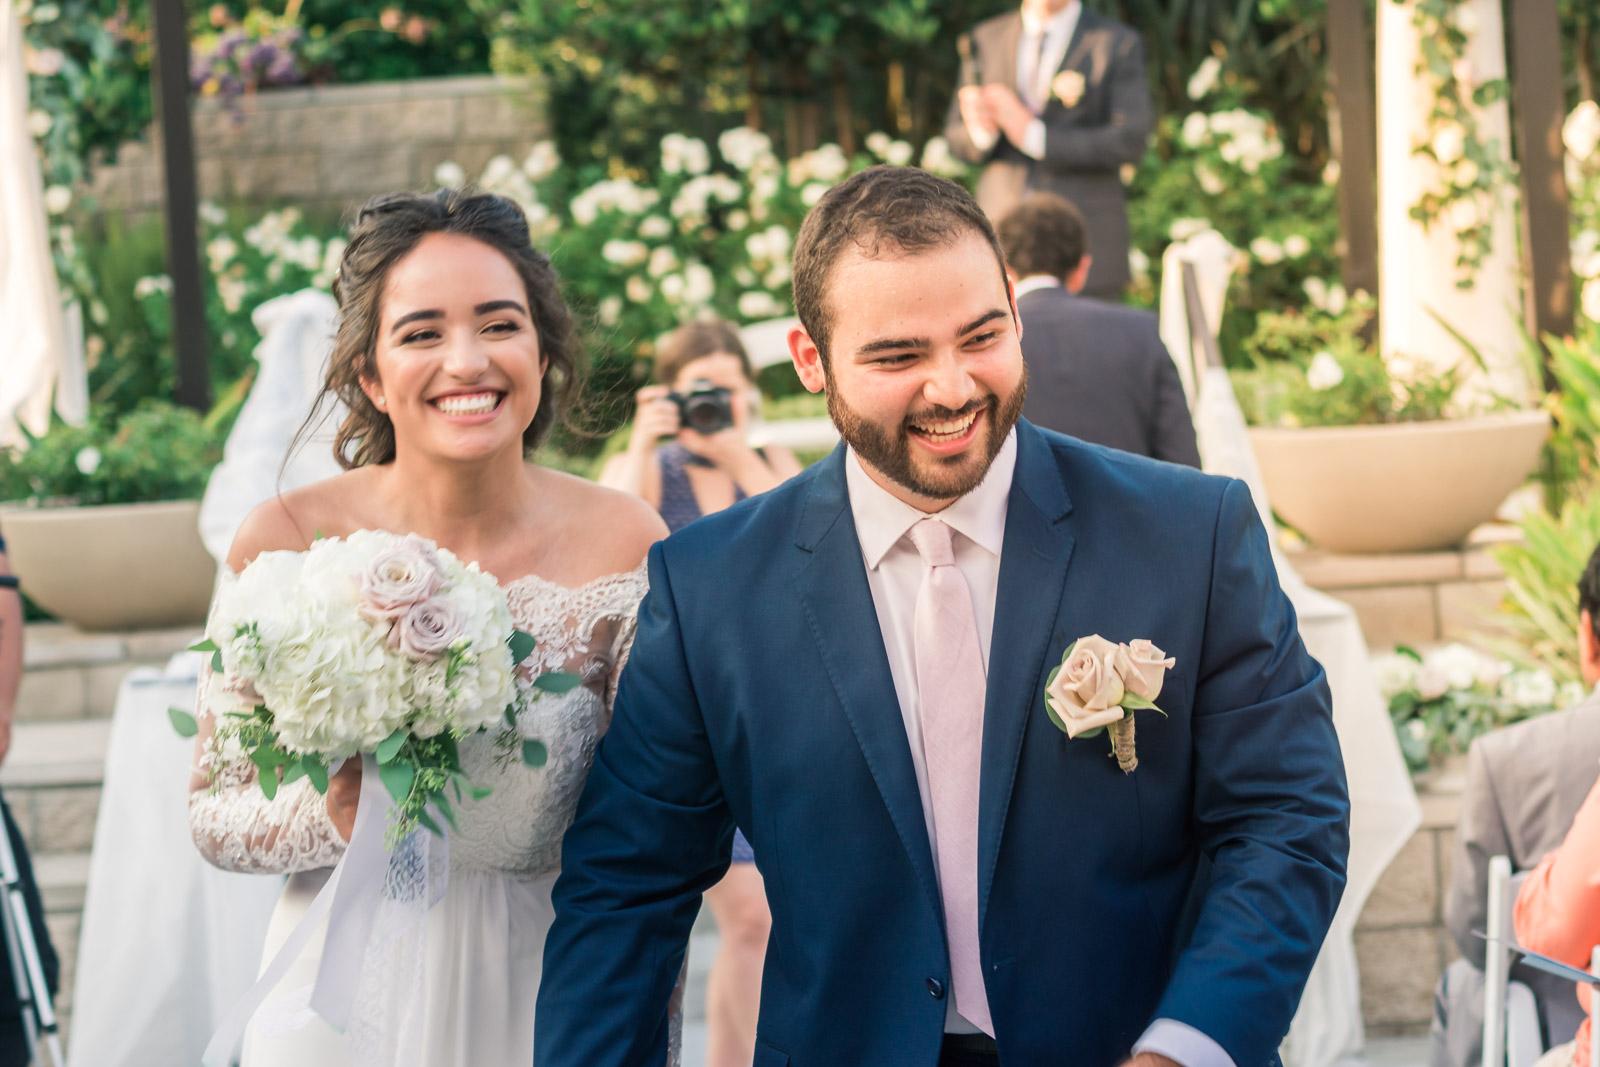 267_Angel-Brea-Orange-County_Joseph-Barber-Wedding-Photography.jpg